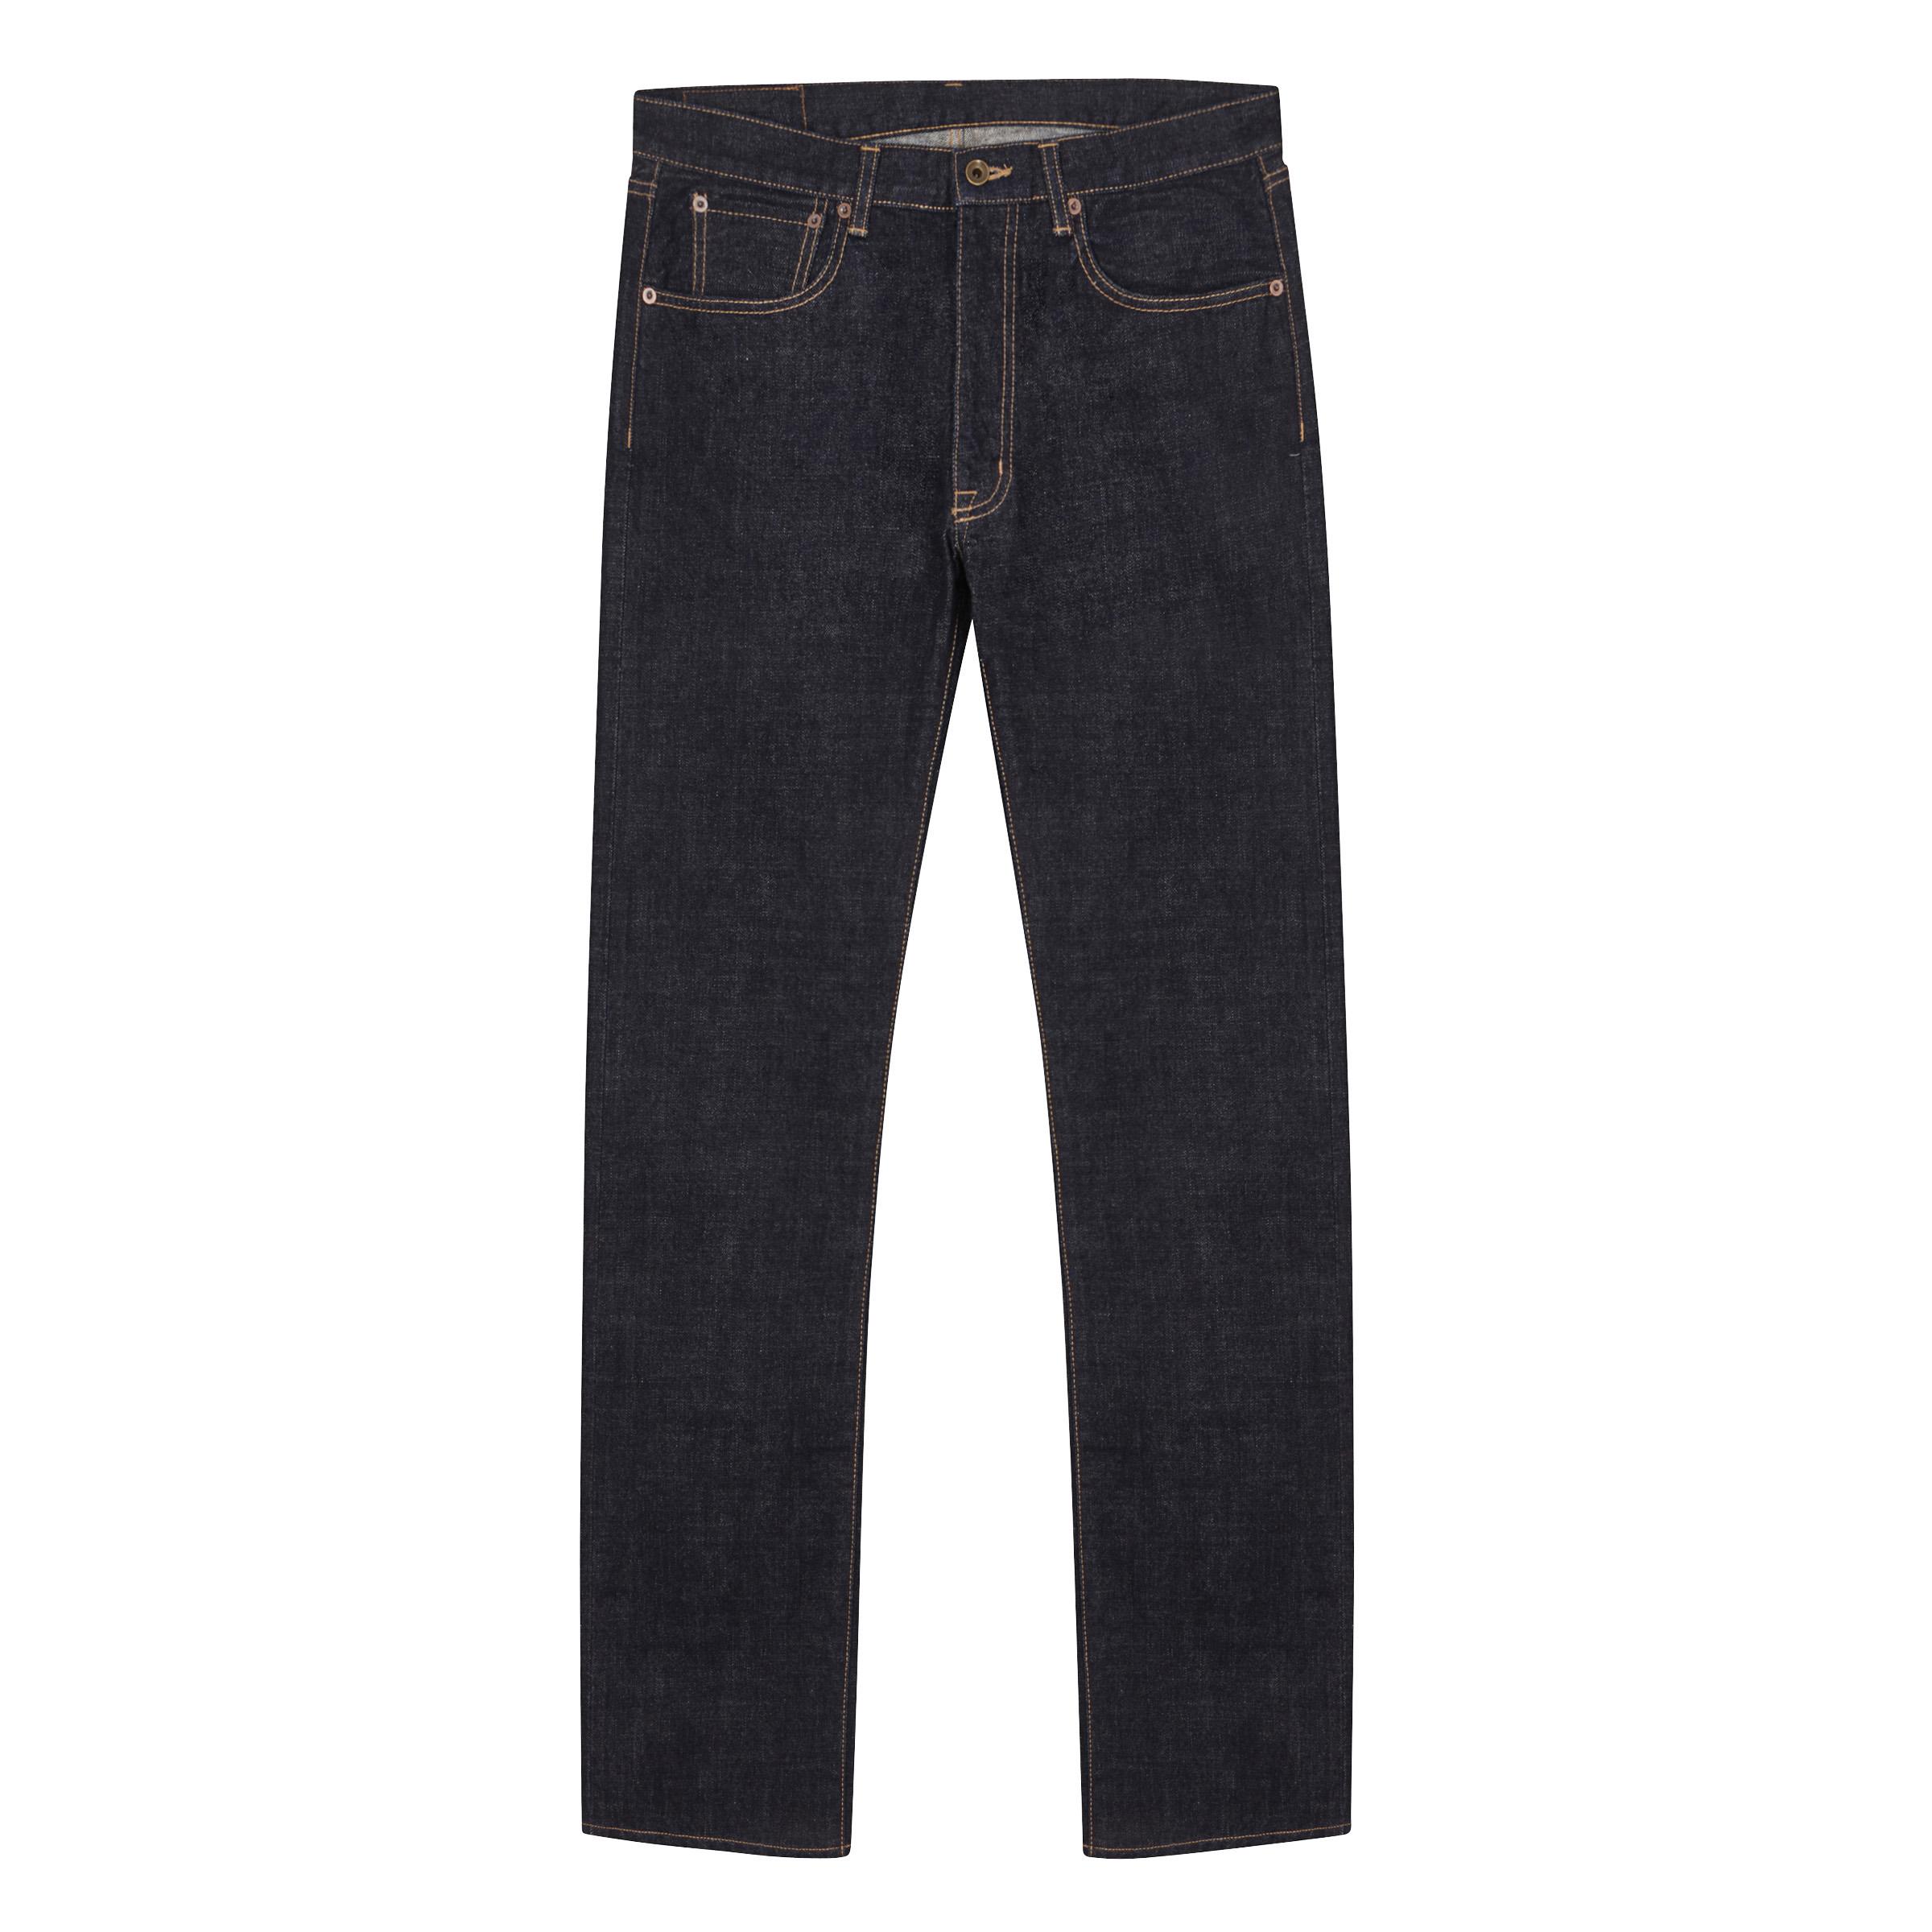 Navy Cotton Kurashiki Japanese Denim Zip Fastening Jeans